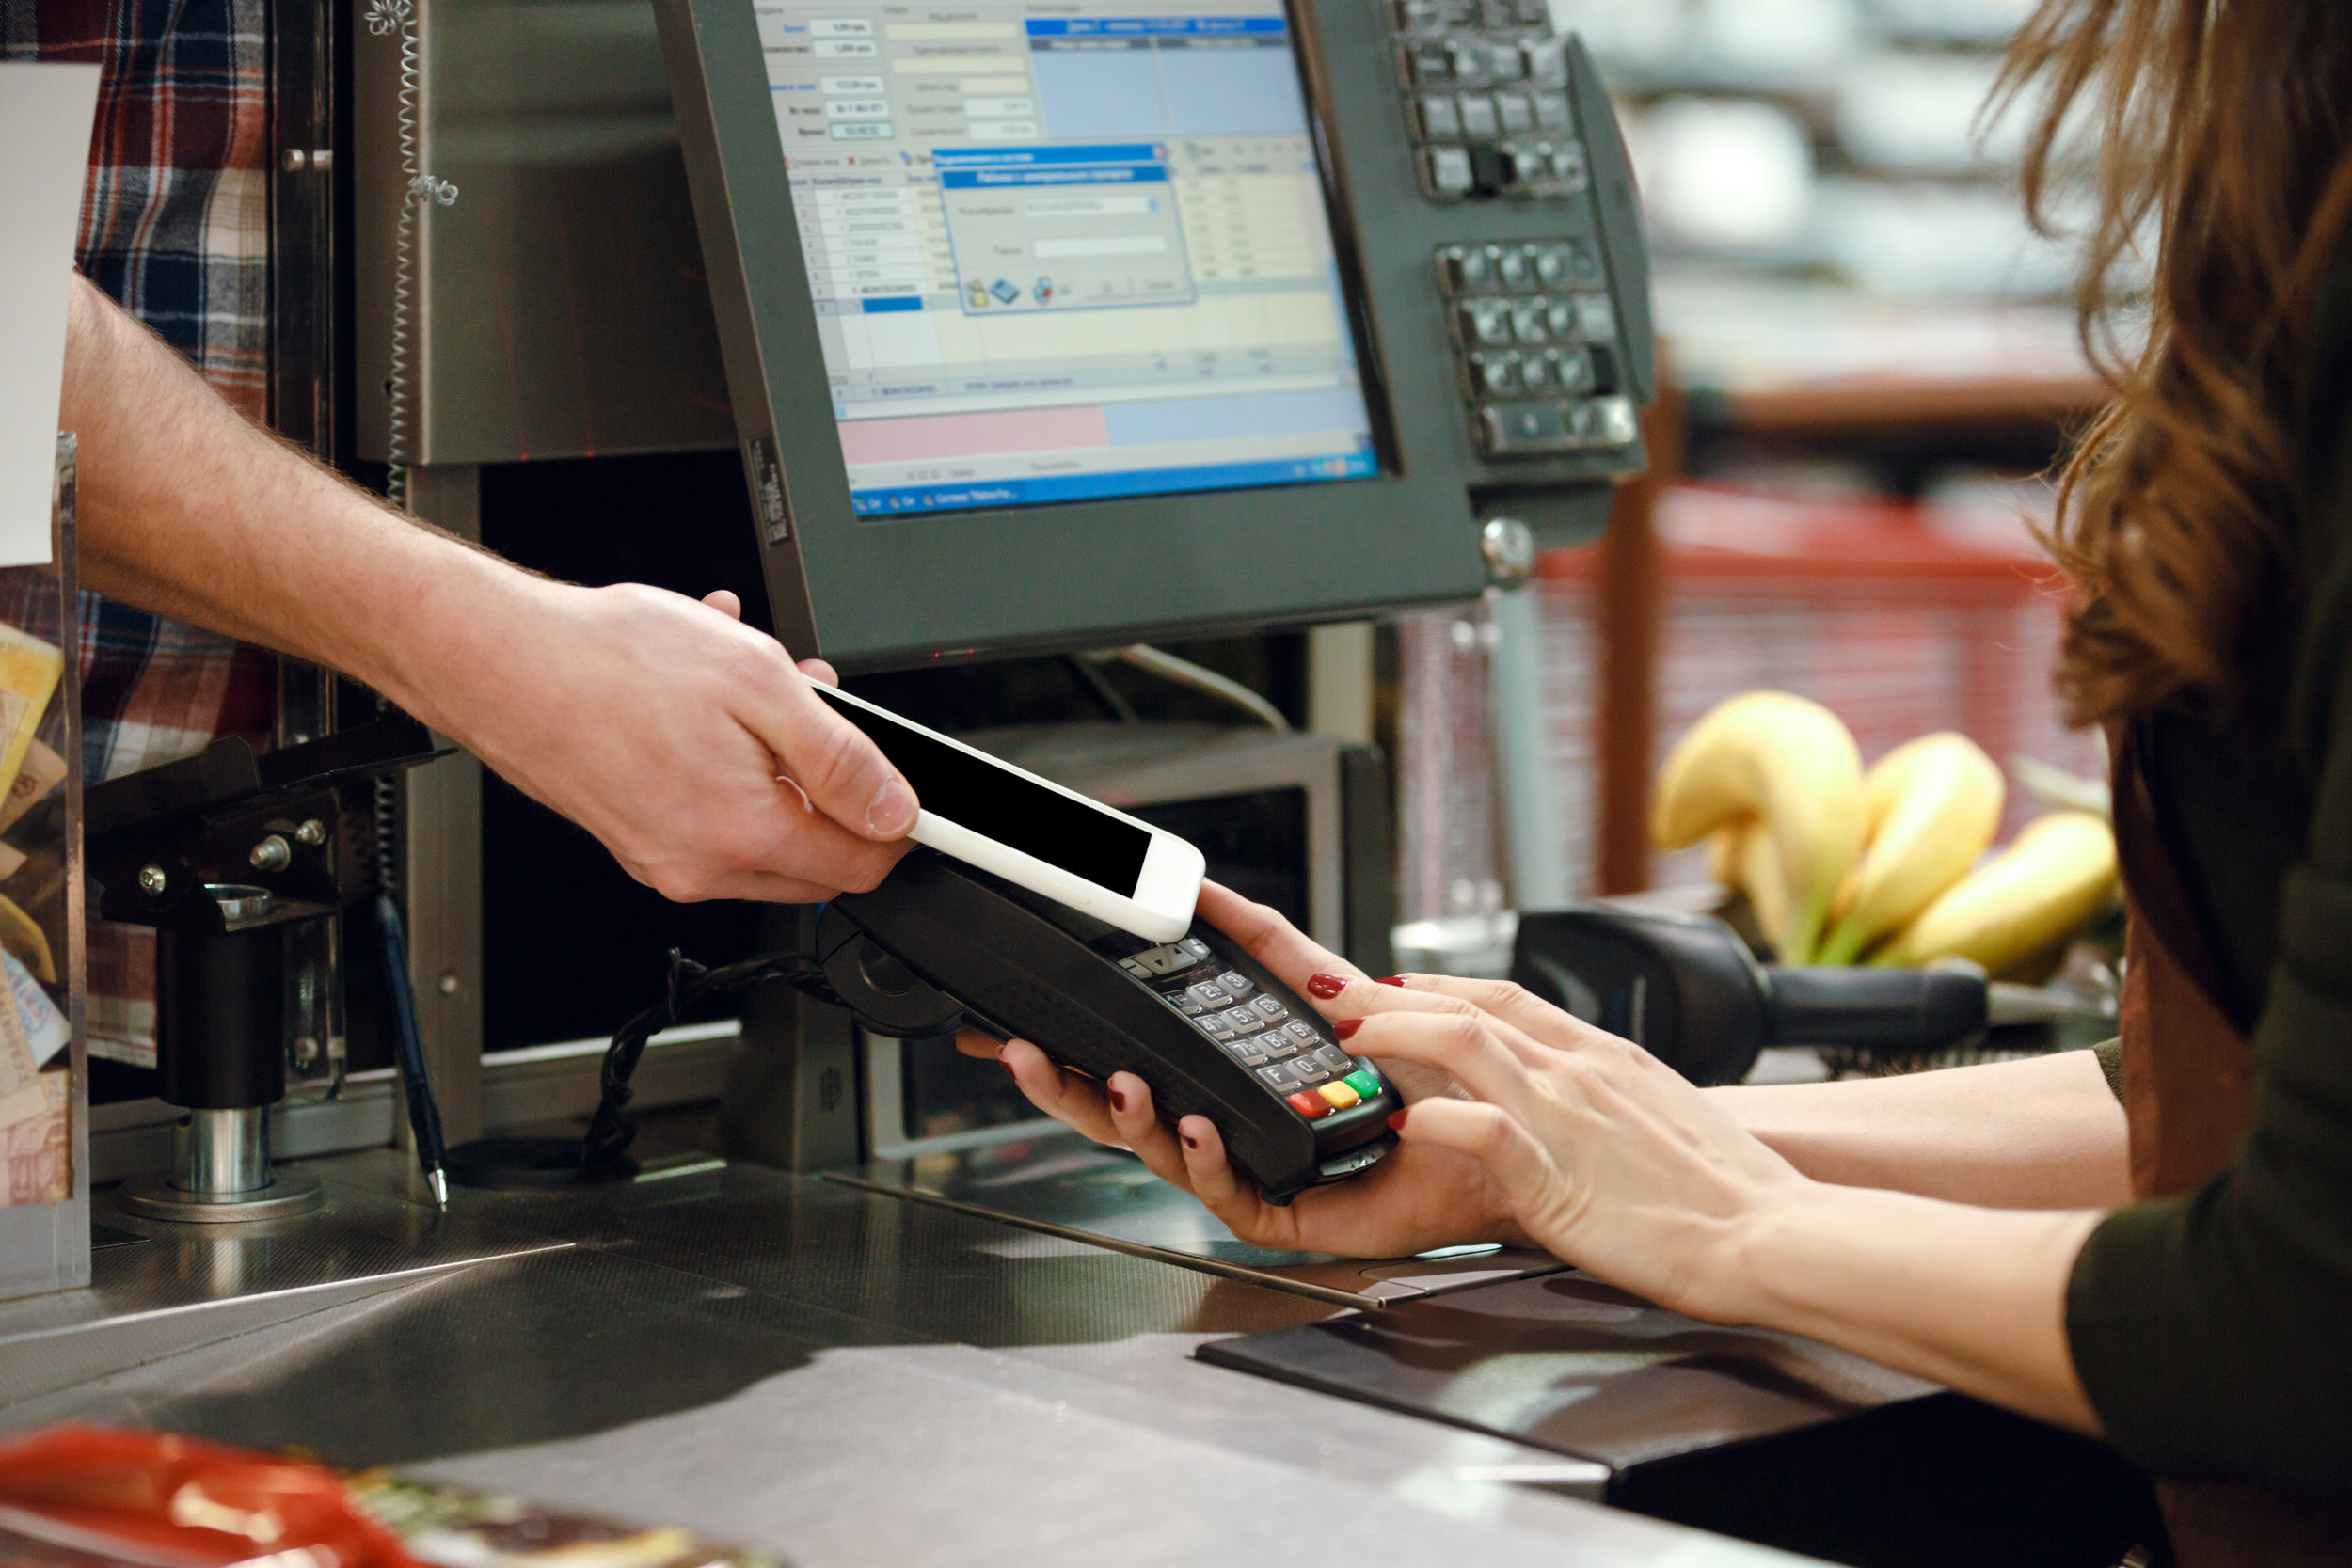 cropped-image-of-cashier-woman-create-payment-PQAUMU3.jpg